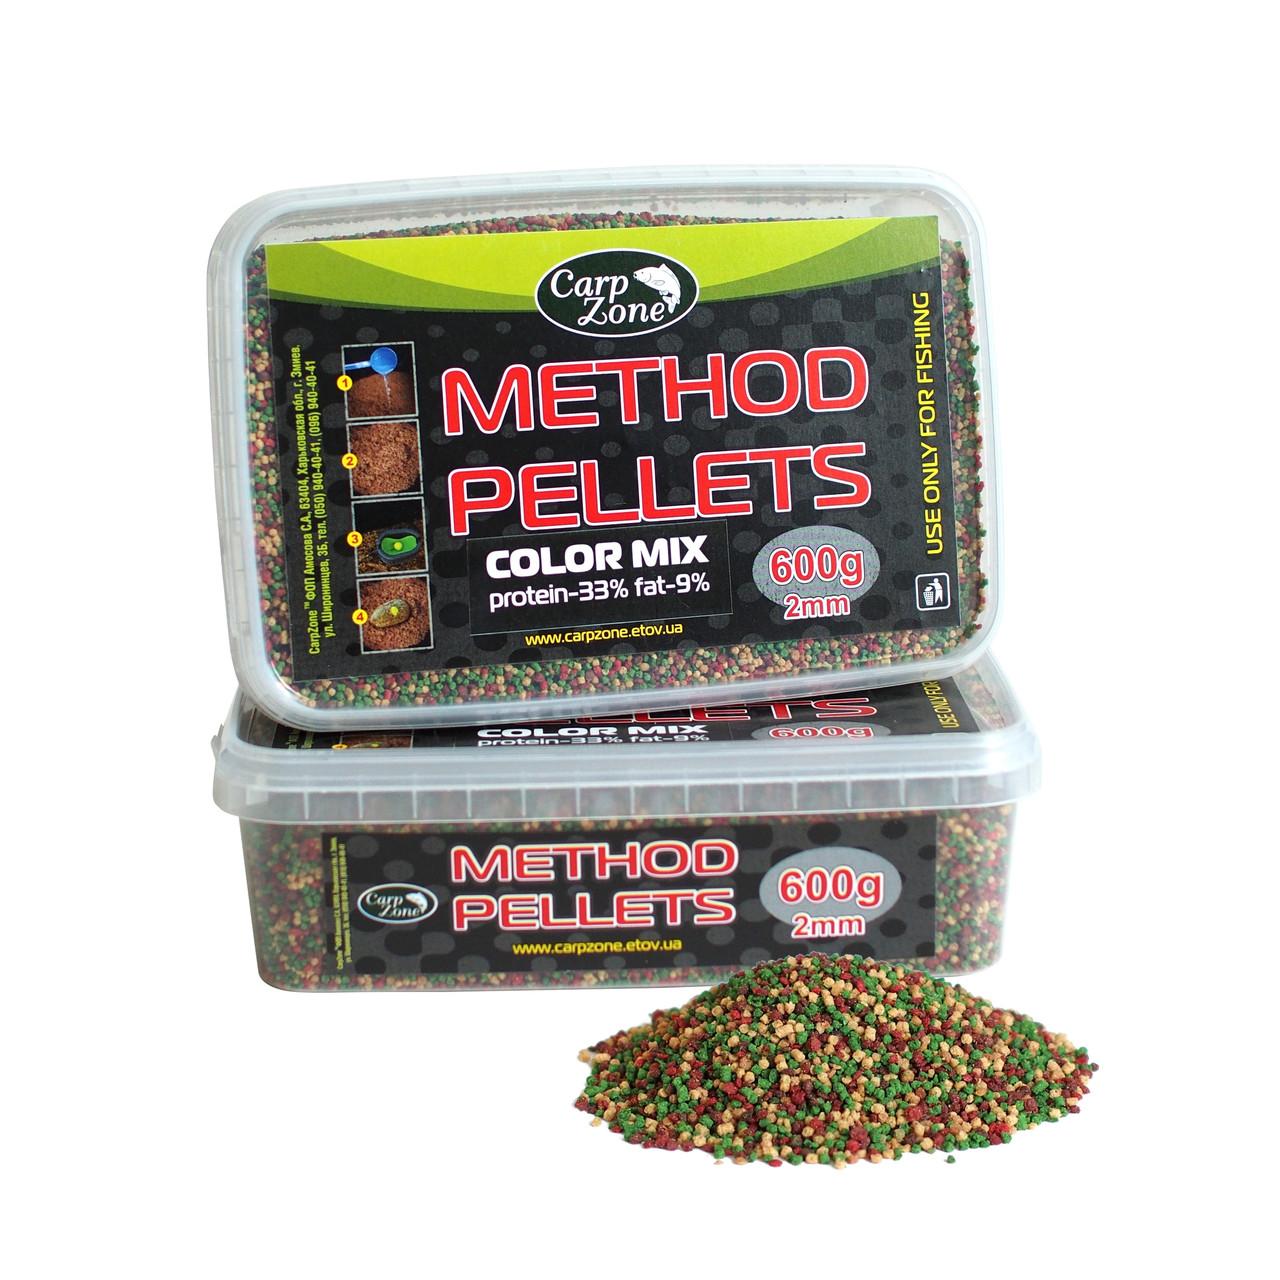 Метод пеллетс Method Pellets Carp Zone Color MIX 2mm 600g